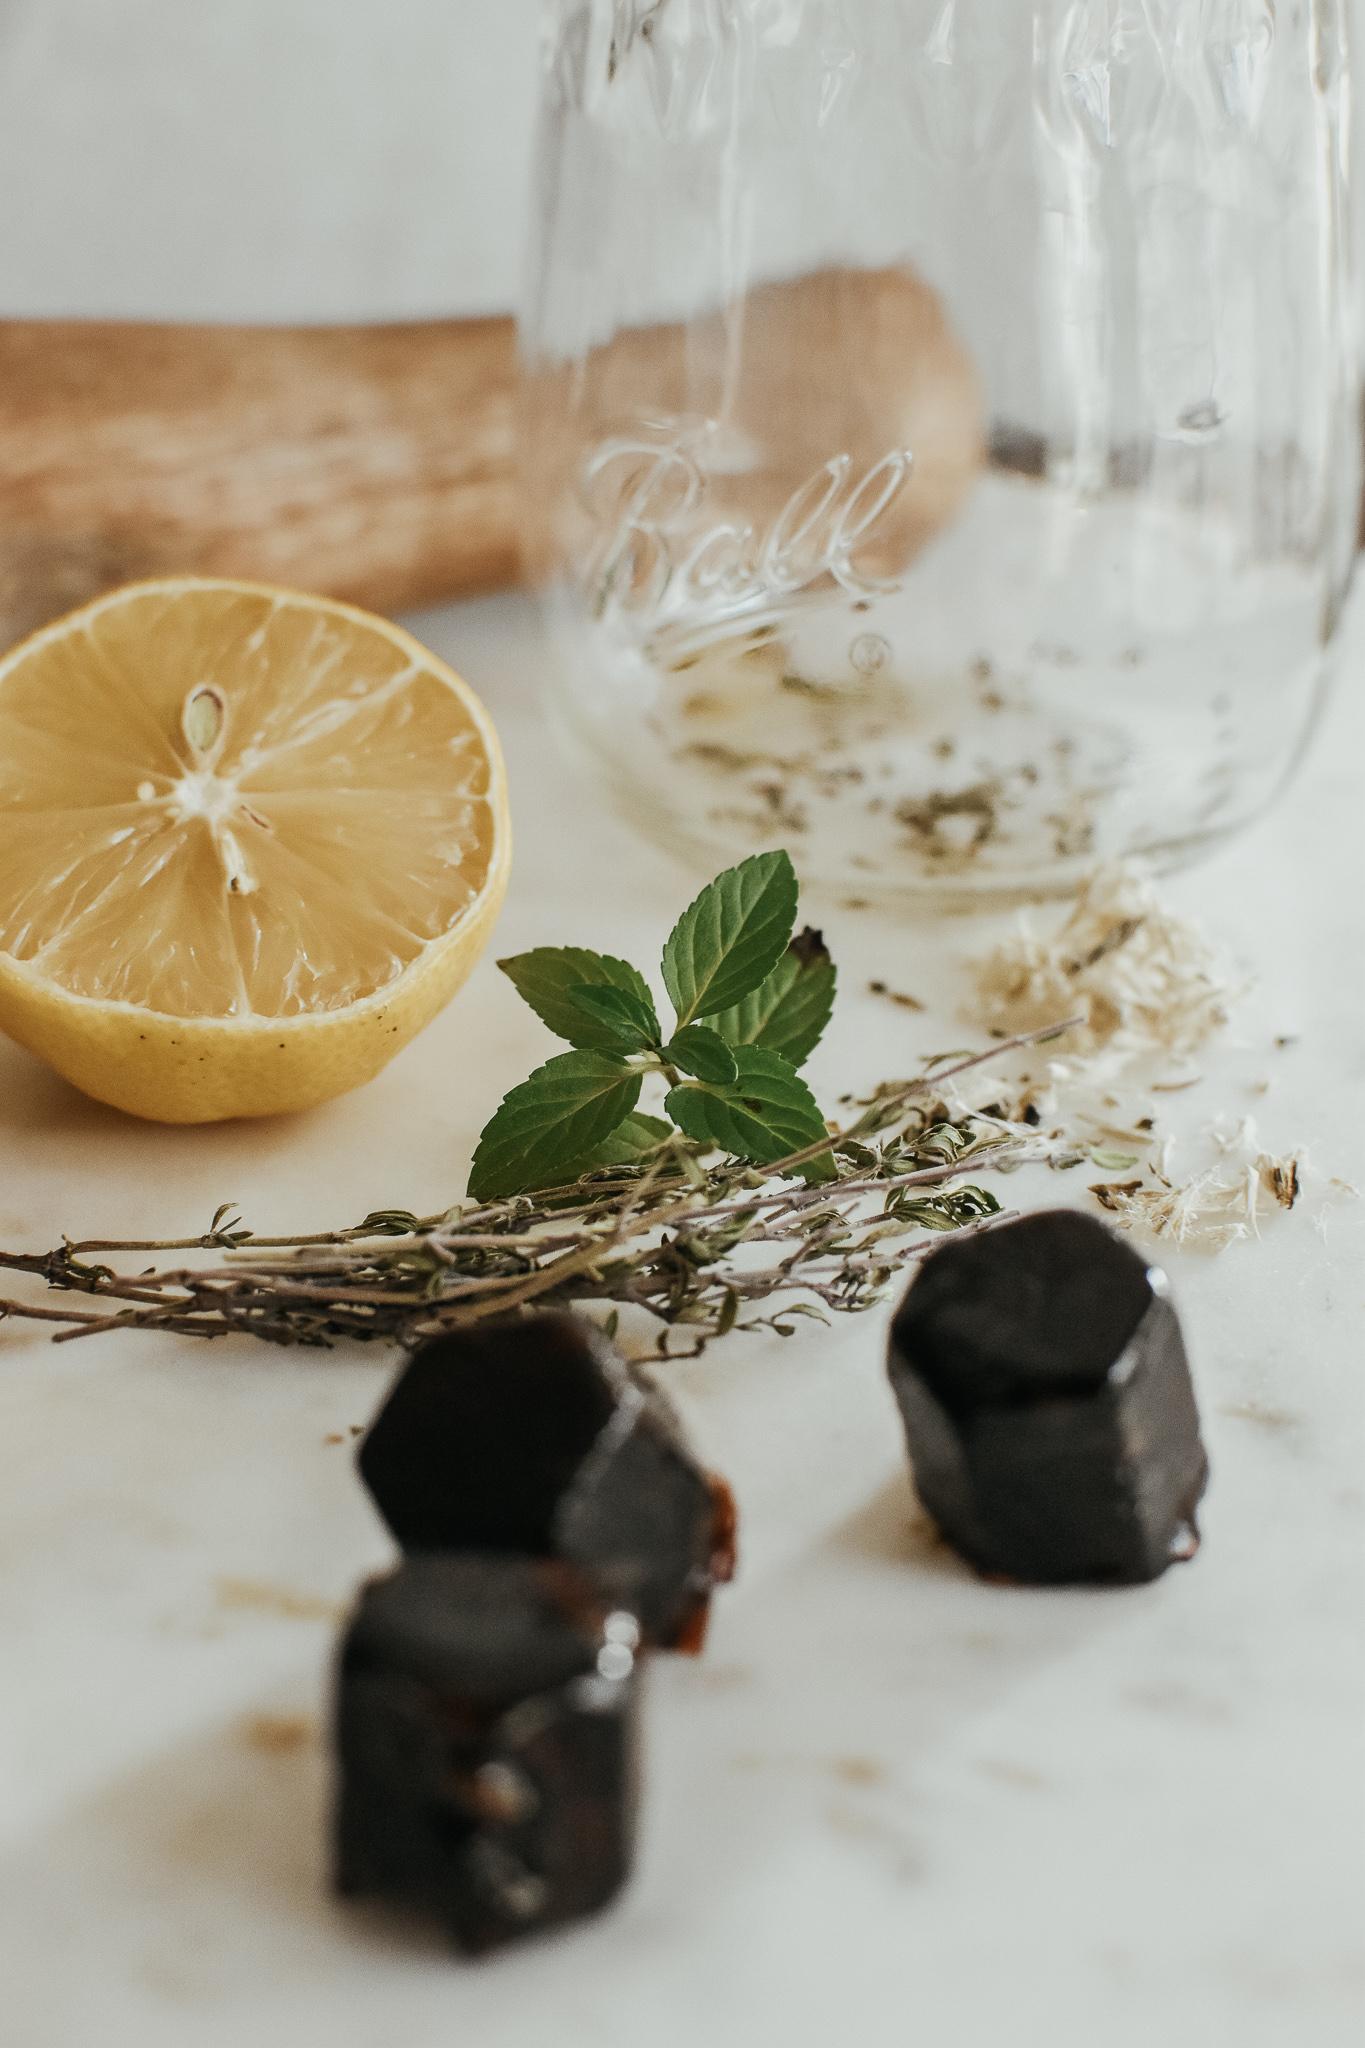 Making Elderberry Gummies for Cold and Flu season